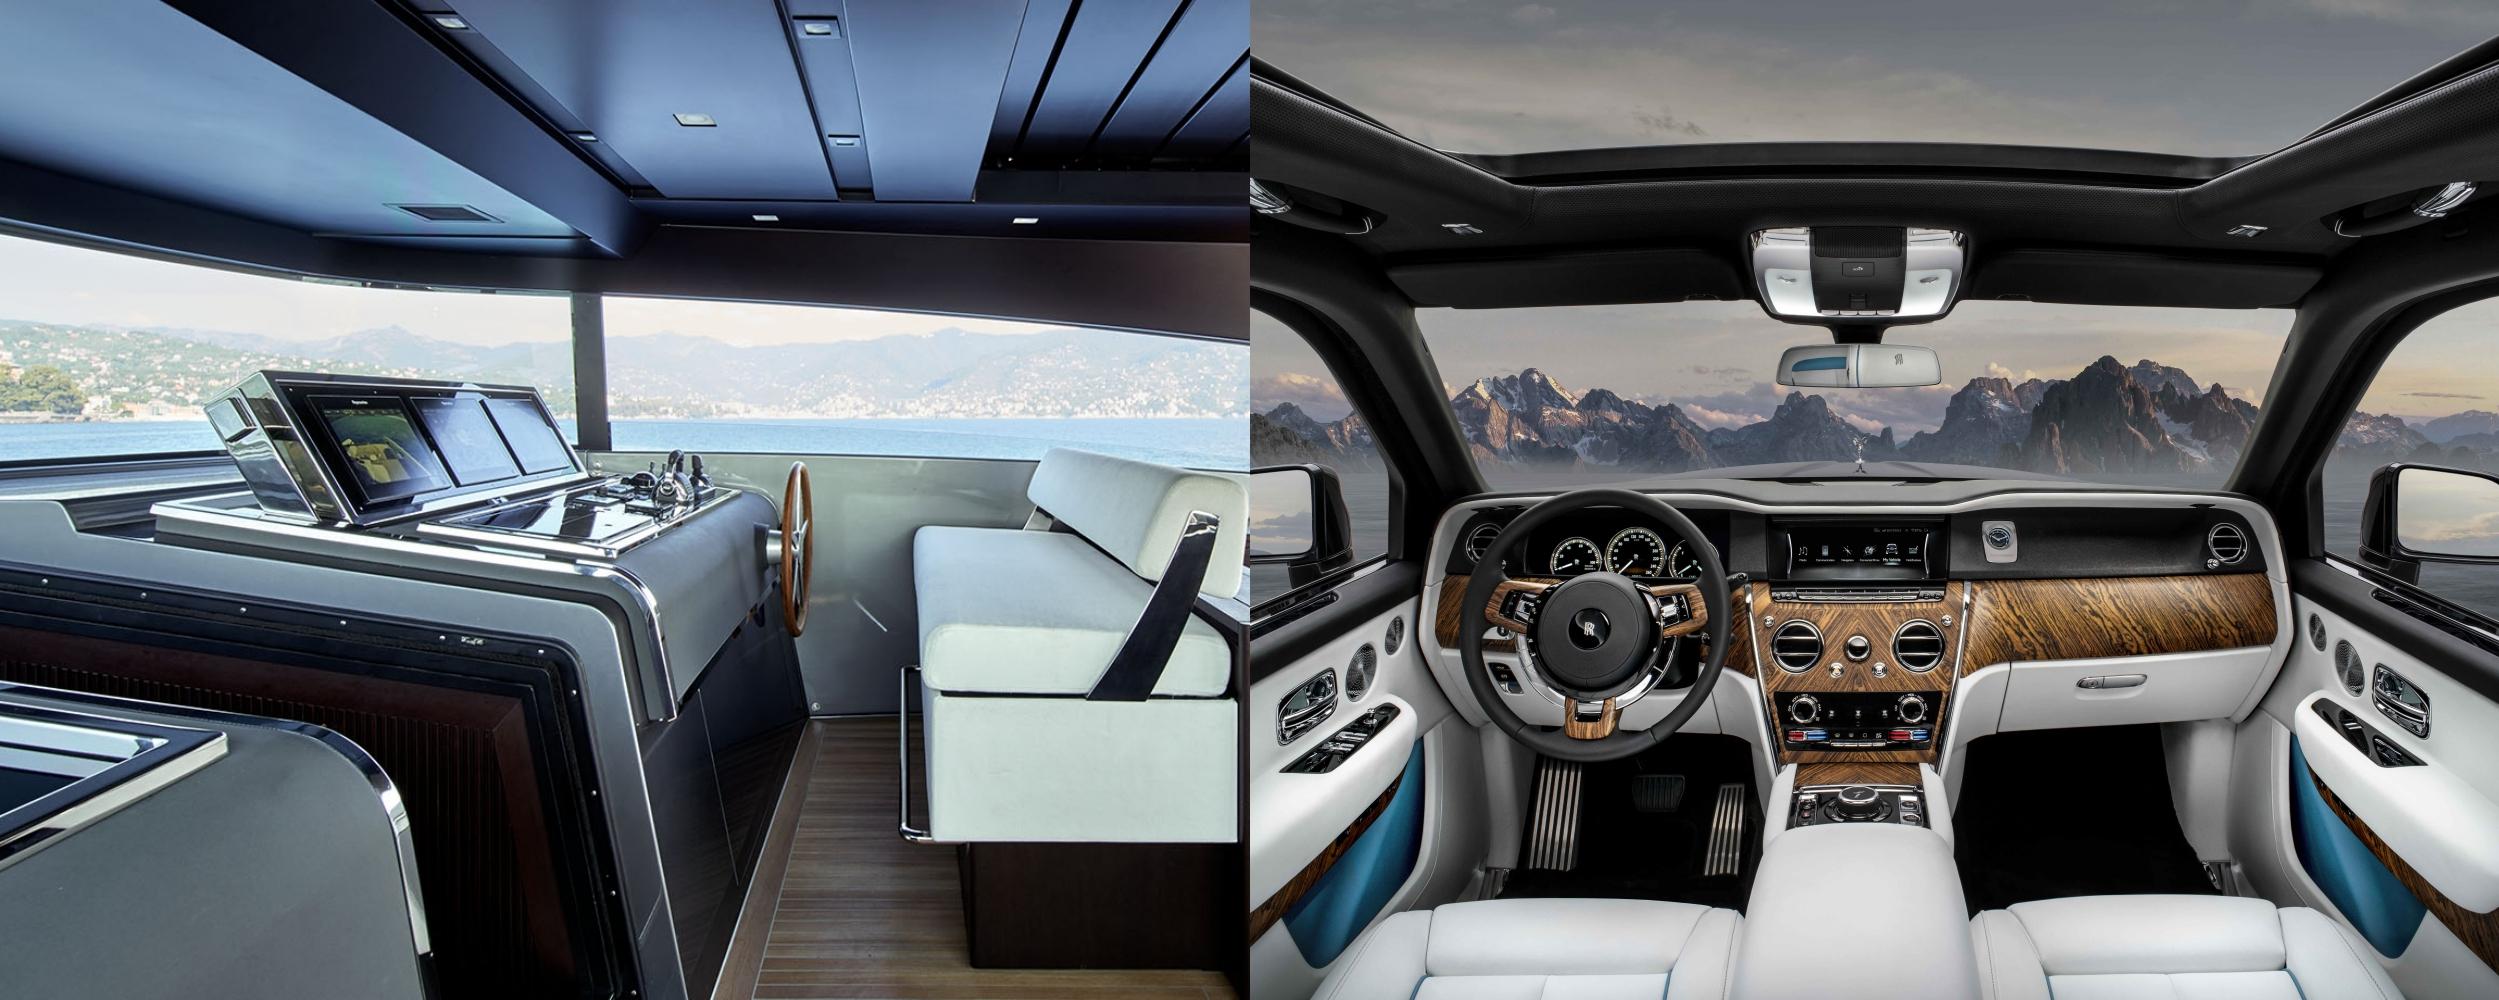 Sanlorenzo and Rolls-Royce